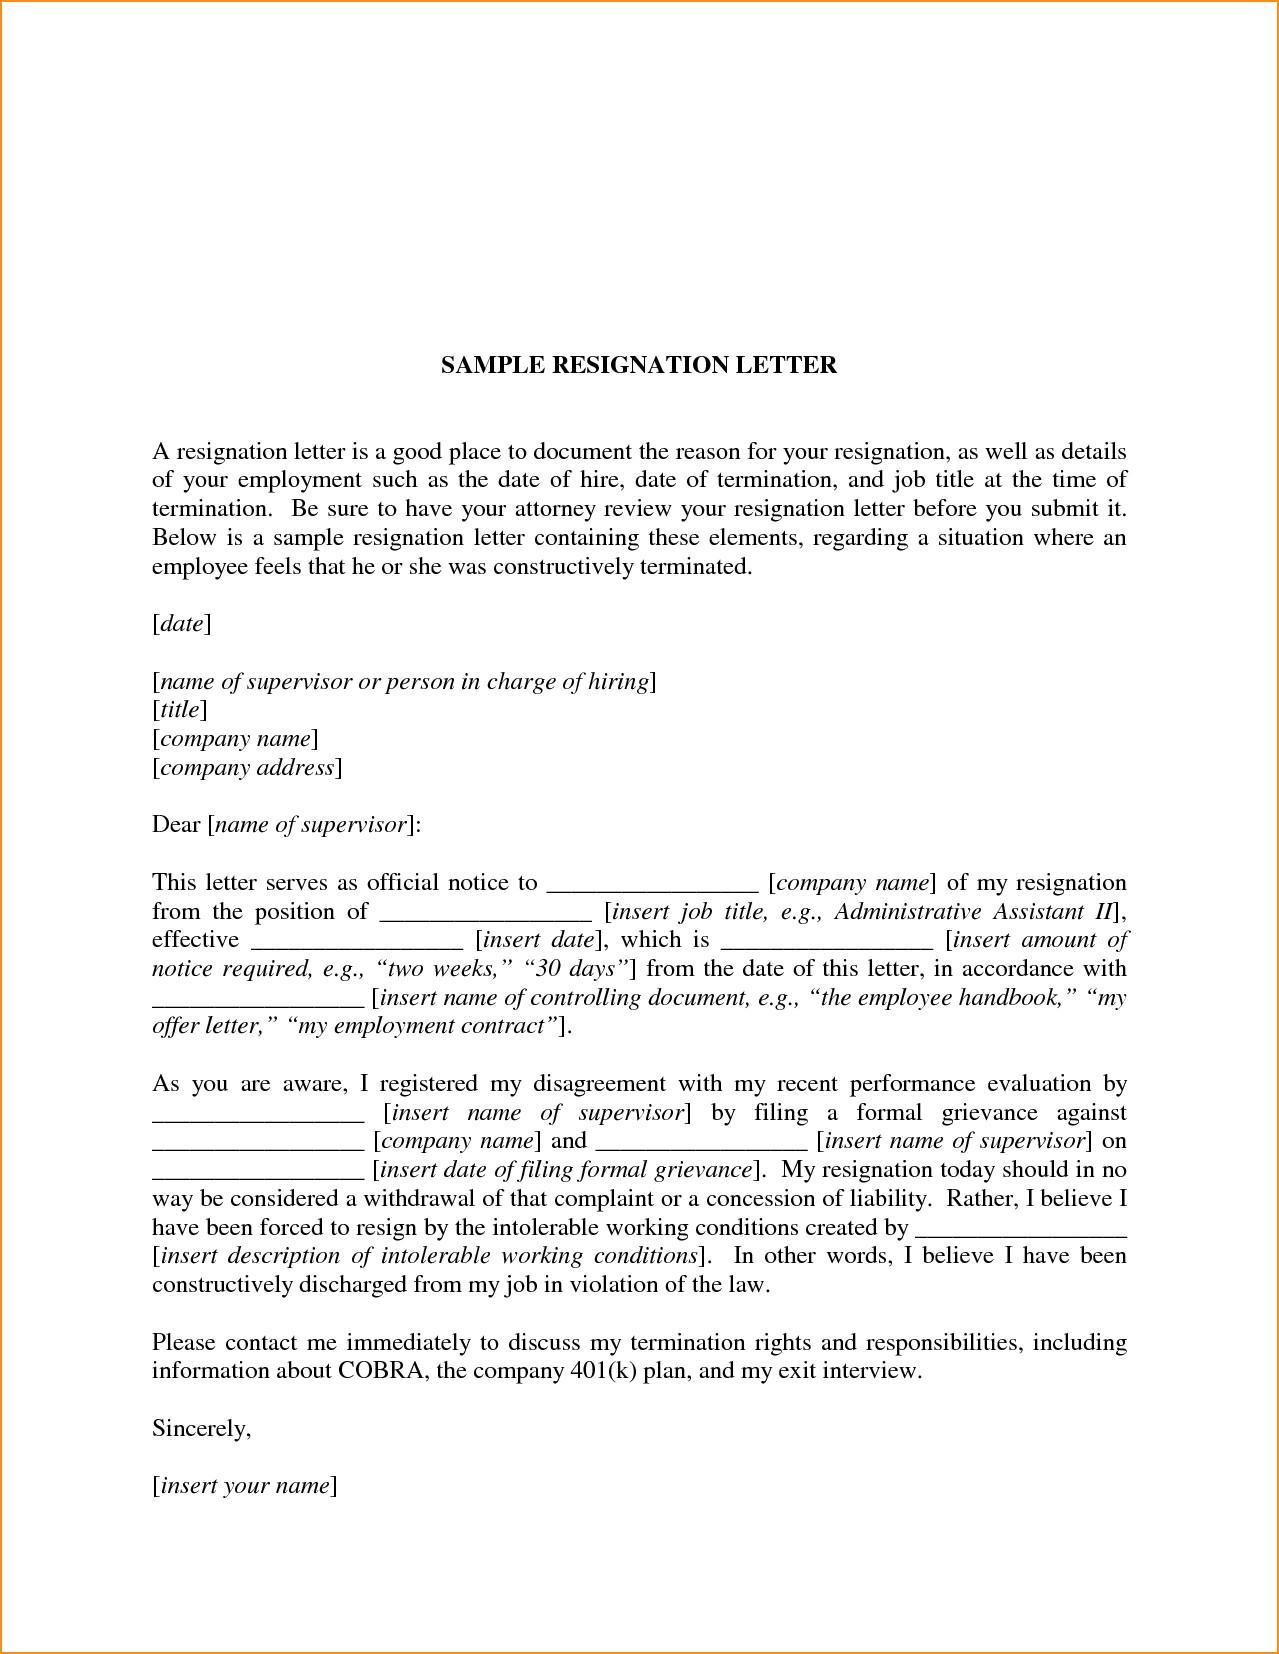 Letter Of Resignation Nursing Template - Nursing Job Resignation Letter Valid Resignation Letter Nursing Job